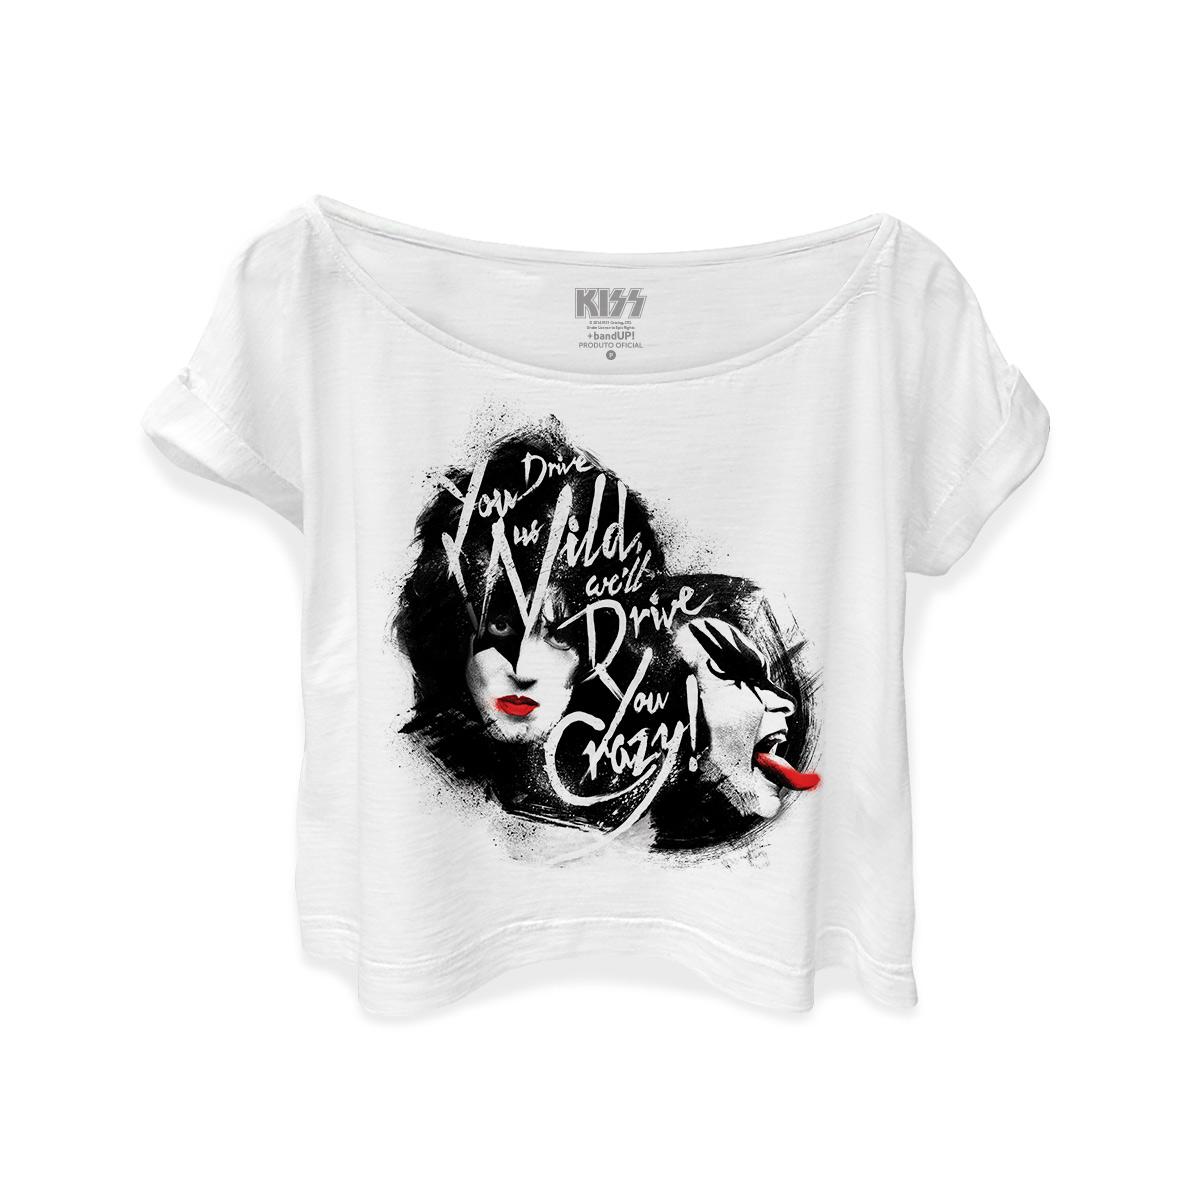 T-shirt Premium Feminina Kiss Dressed To Kill